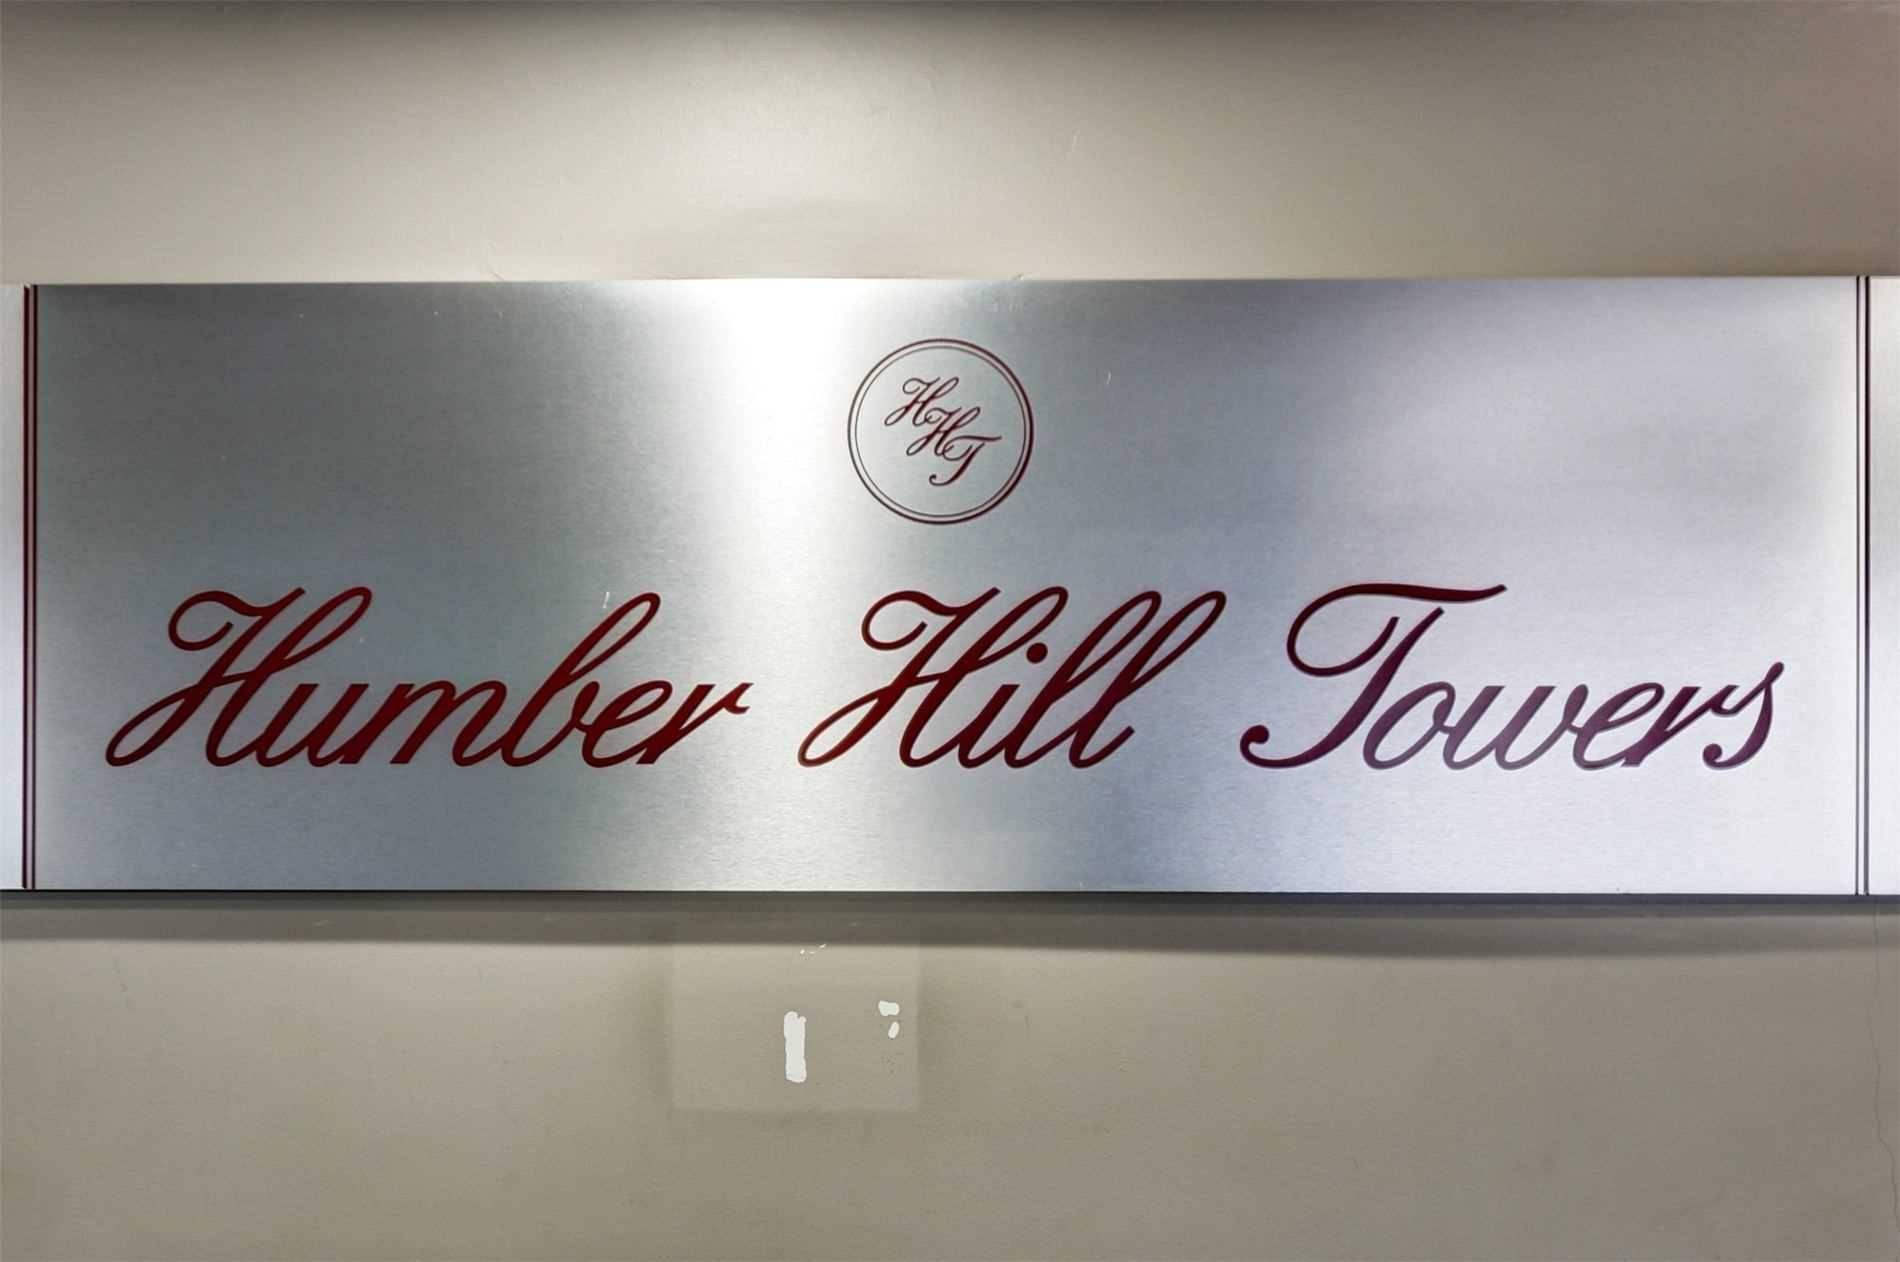 Humber Hill Towers Condos: 15 La Rose Avenue, Toronto, ON